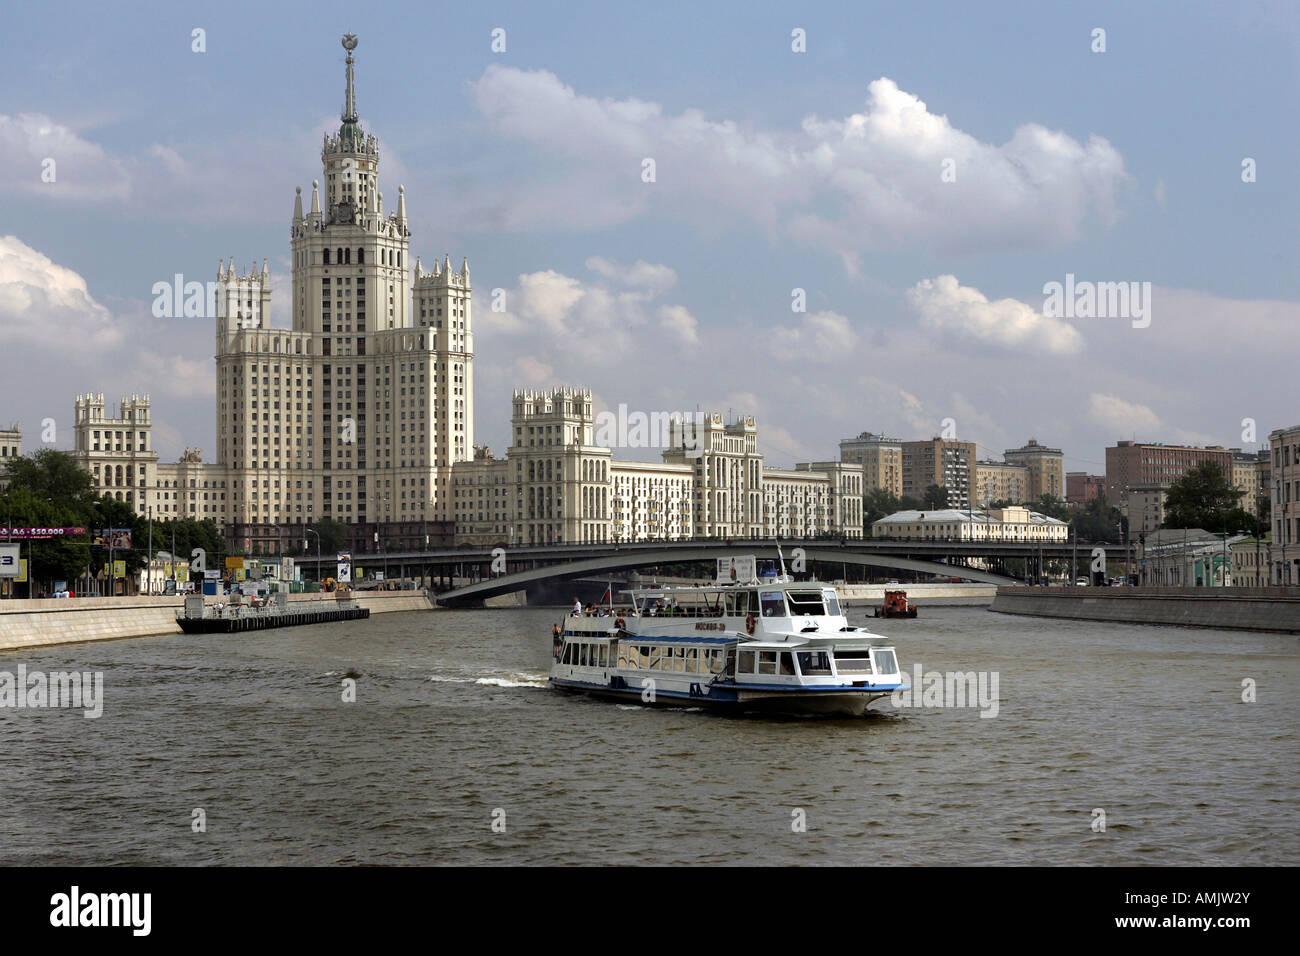 Stalinist skyscraper at Kotelnicheskaya embankment, Moscow, Russia - Stock Image